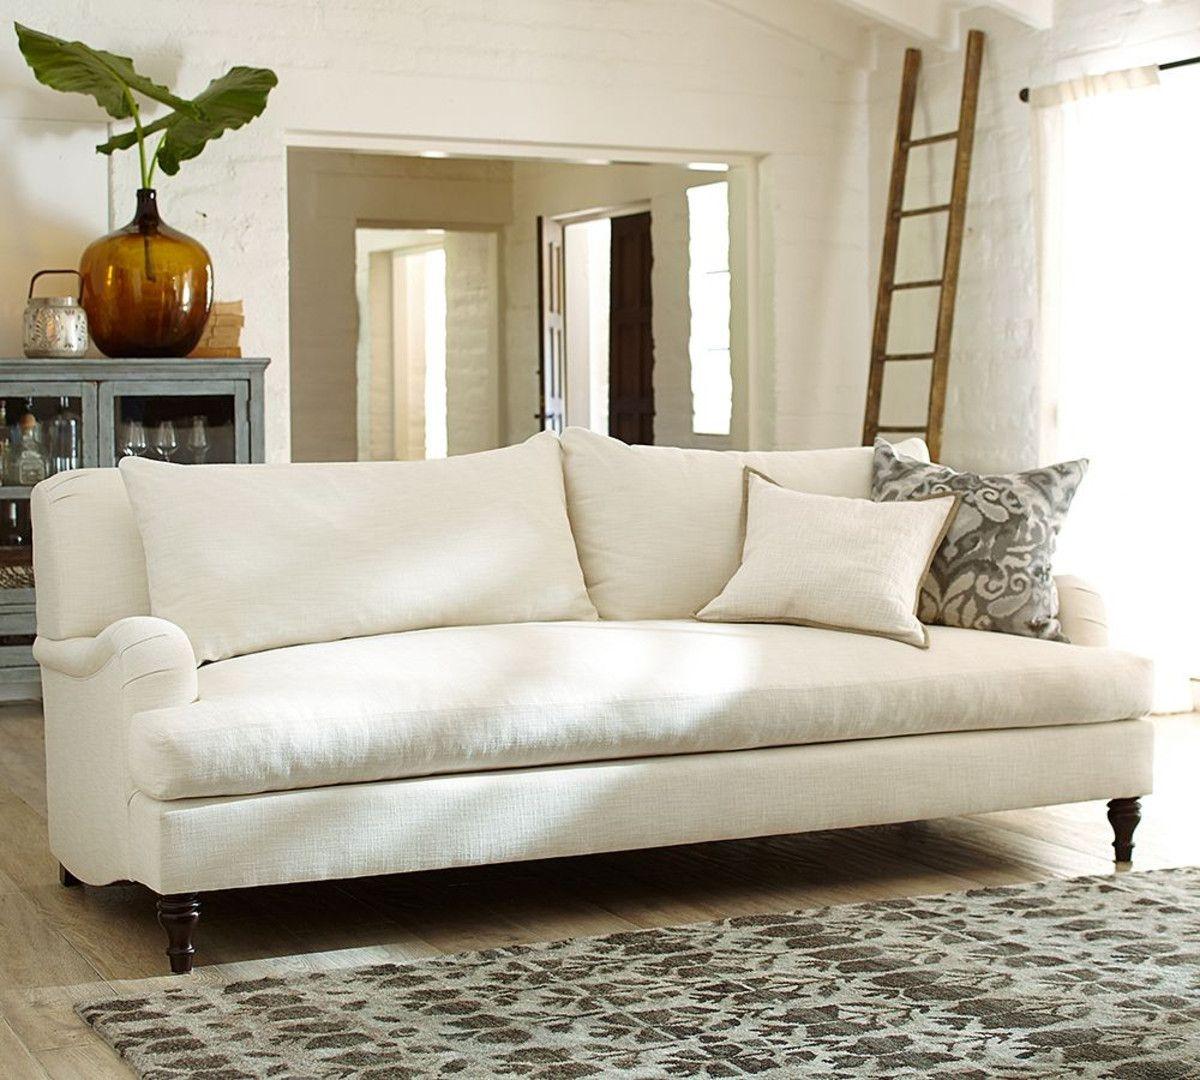 single cushion loveseat foter rh foter com sofa seat cushion foam sofa seat cushions replacement